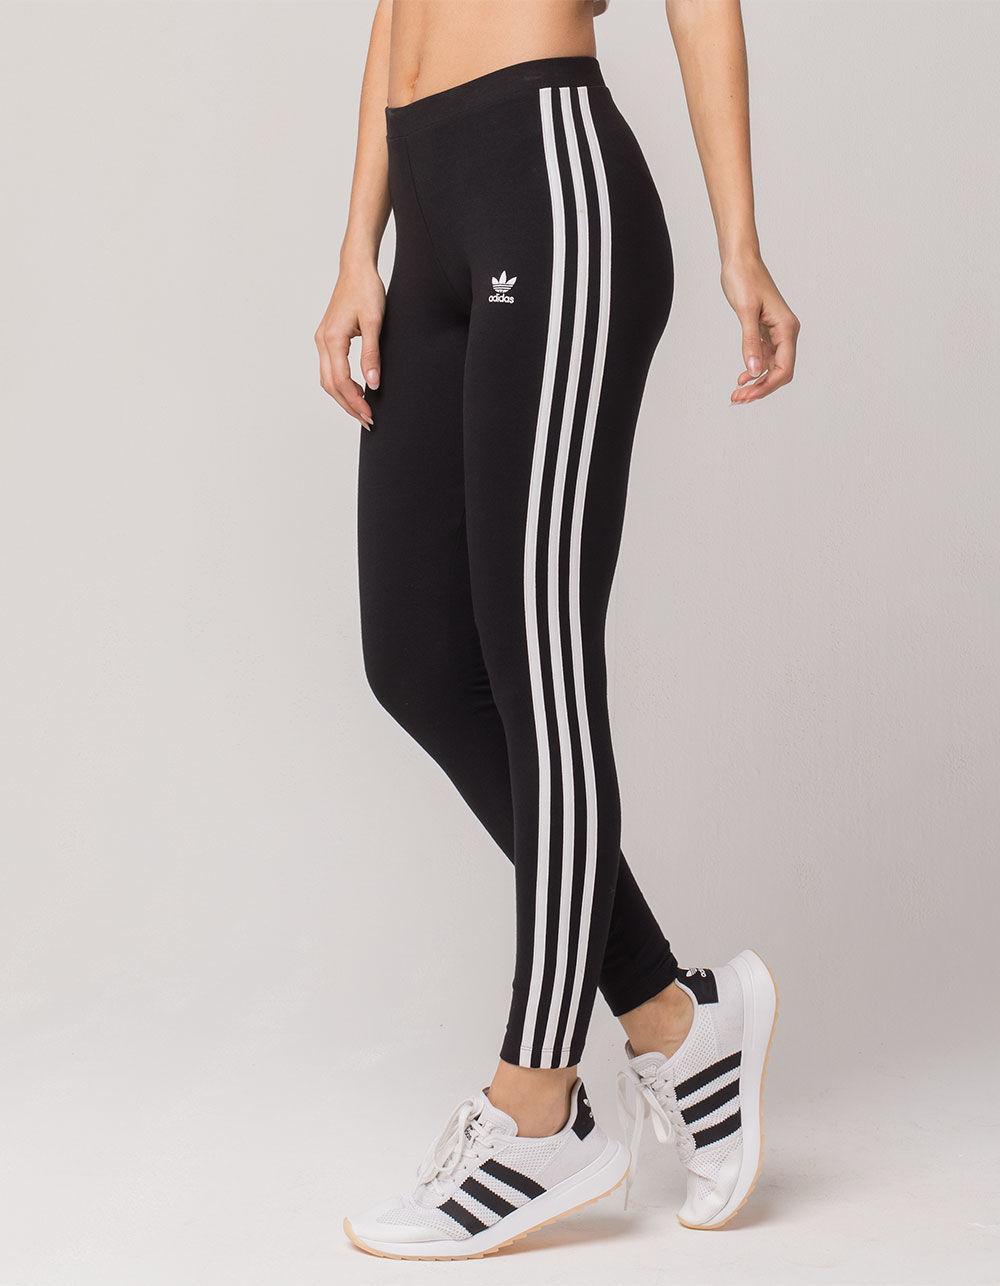 f36a00ca68e96 adidas 3 Stripes Womens Leggings in Black - Lyst